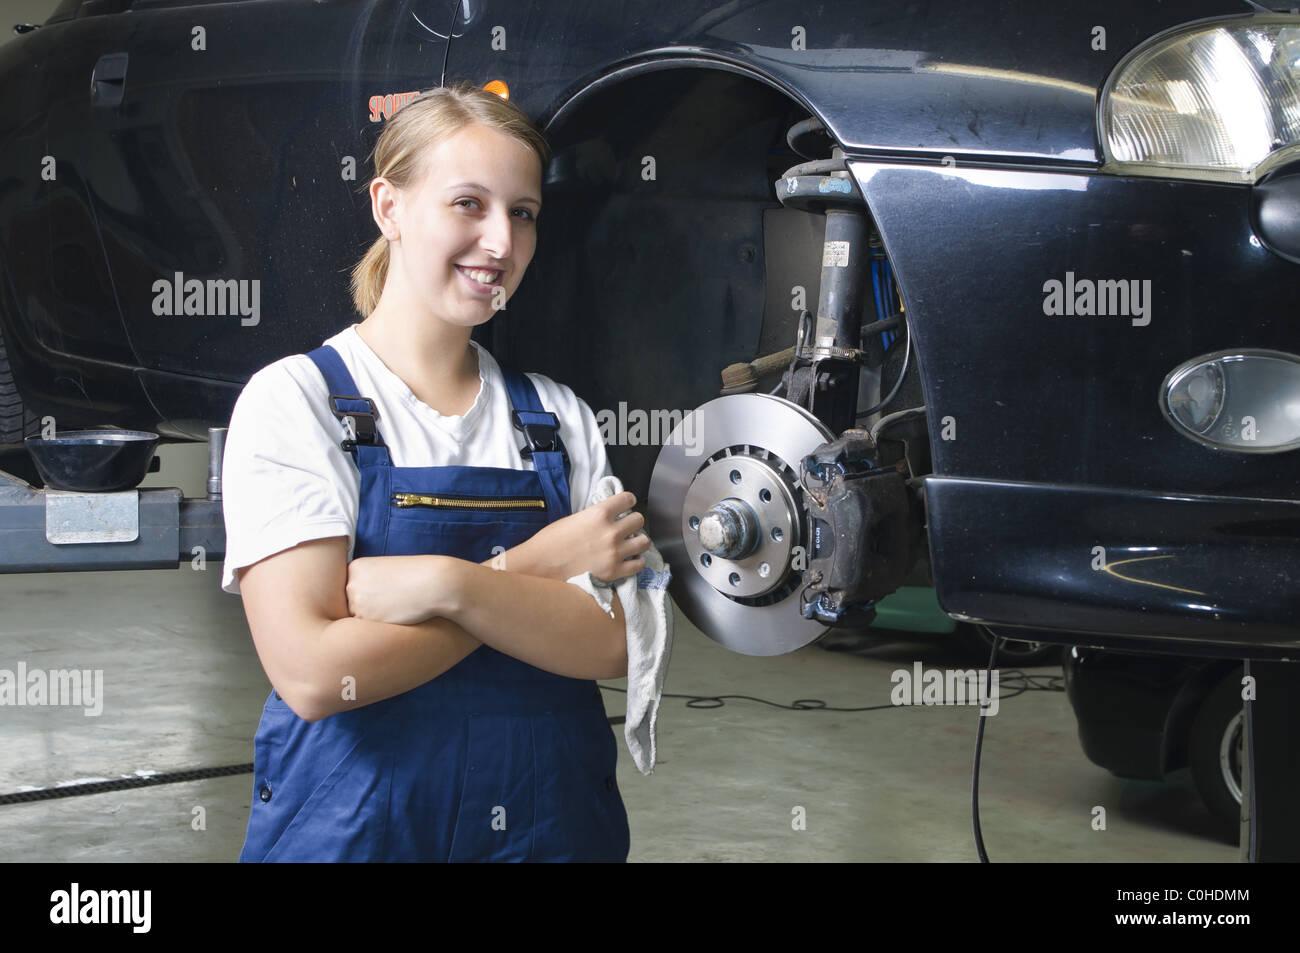 Kfz Mechaniker Motor Mechanic Stock Photos & Kfz Mechaniker Motor ...